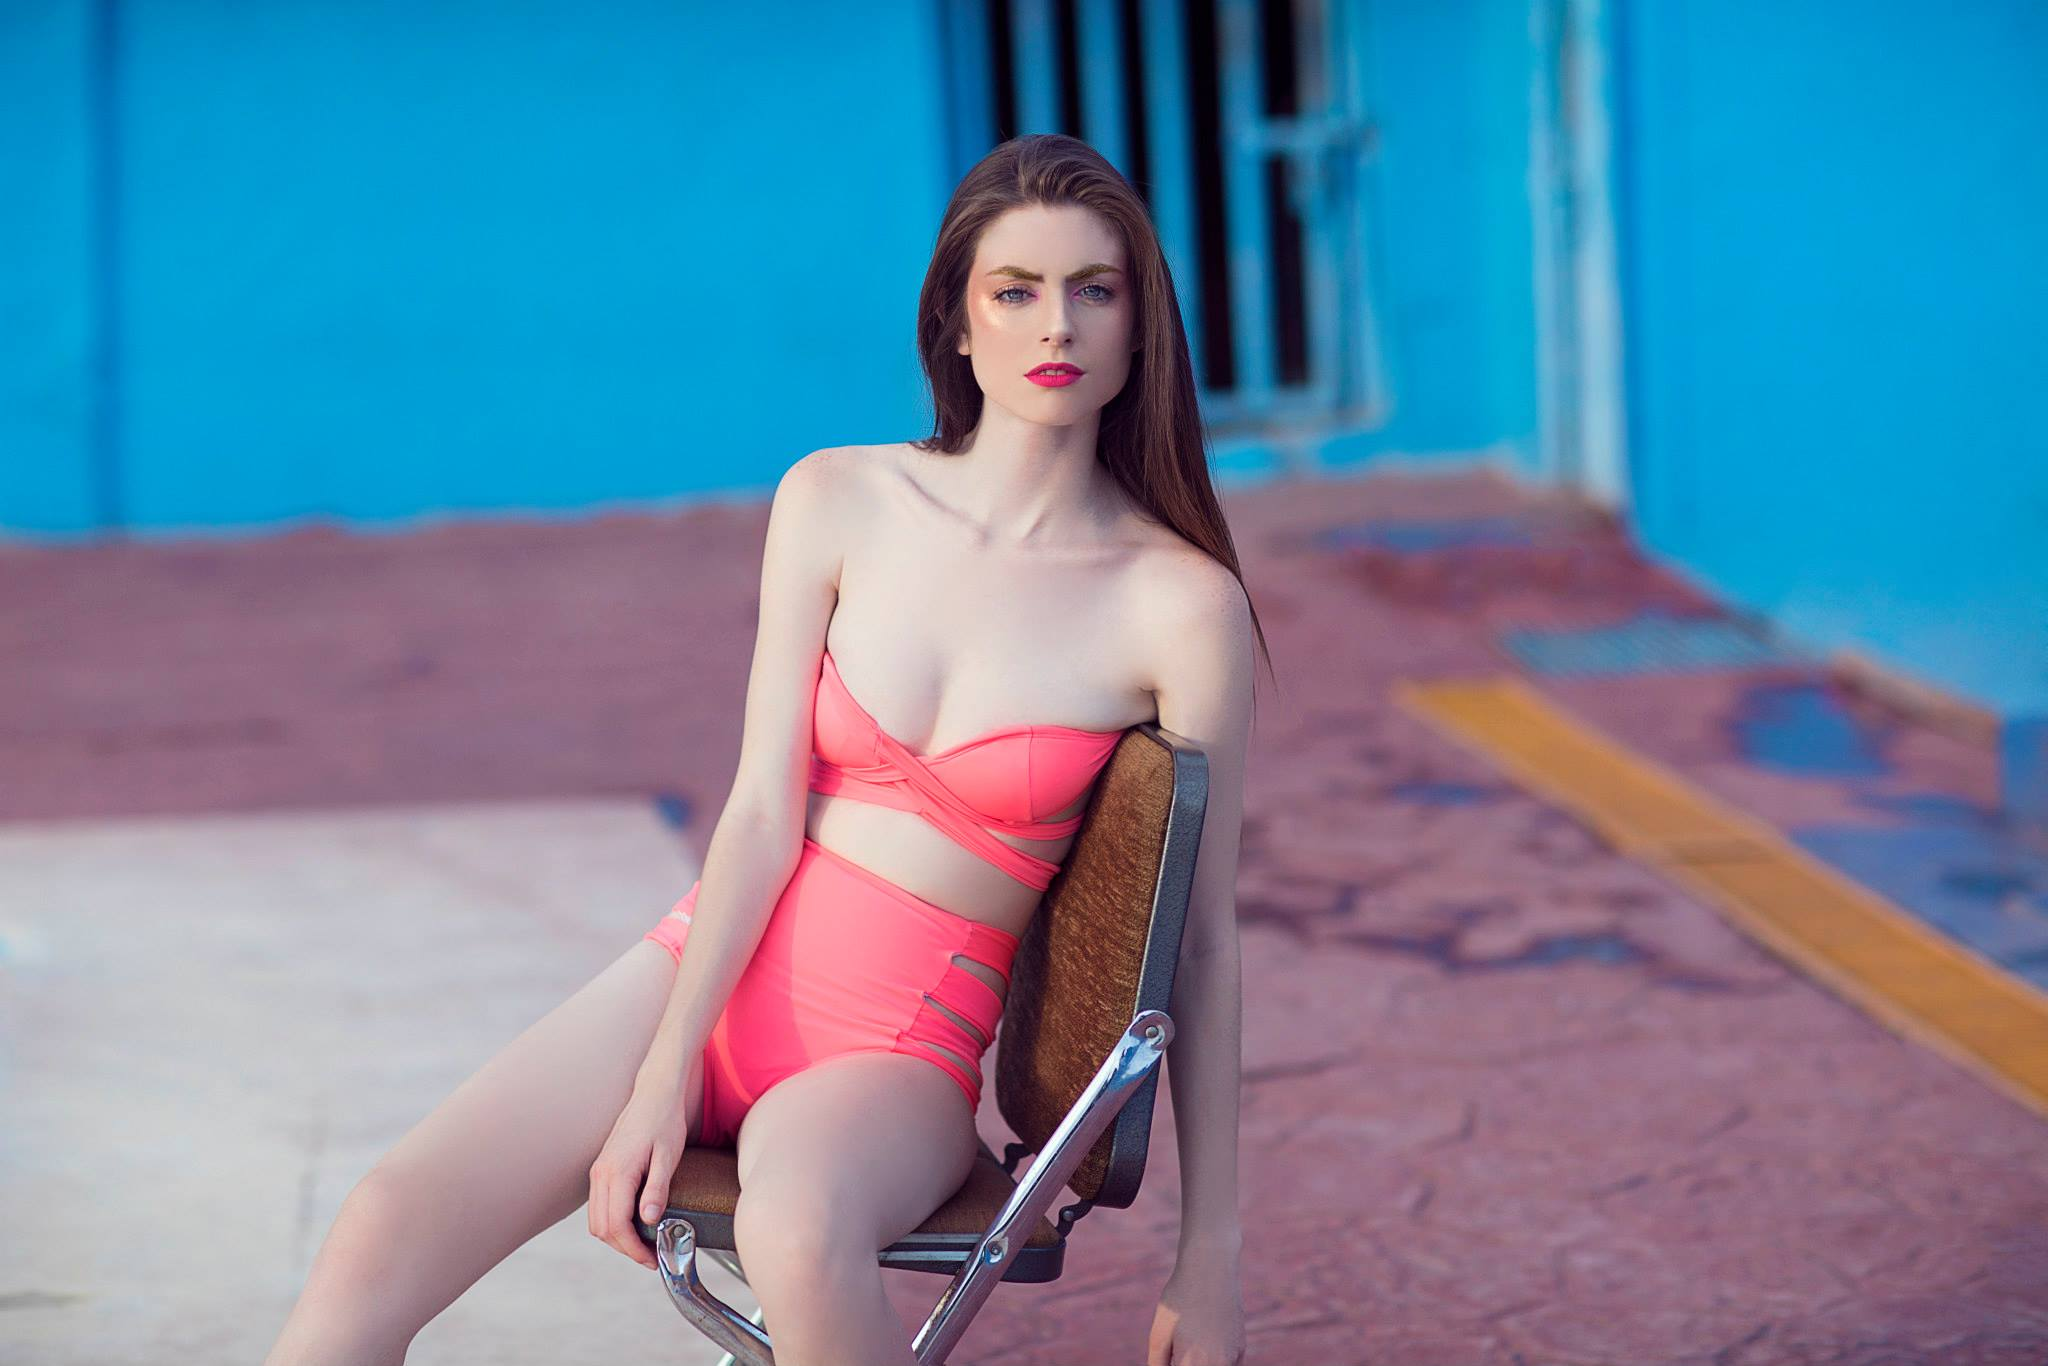 Lucía González, Model of August